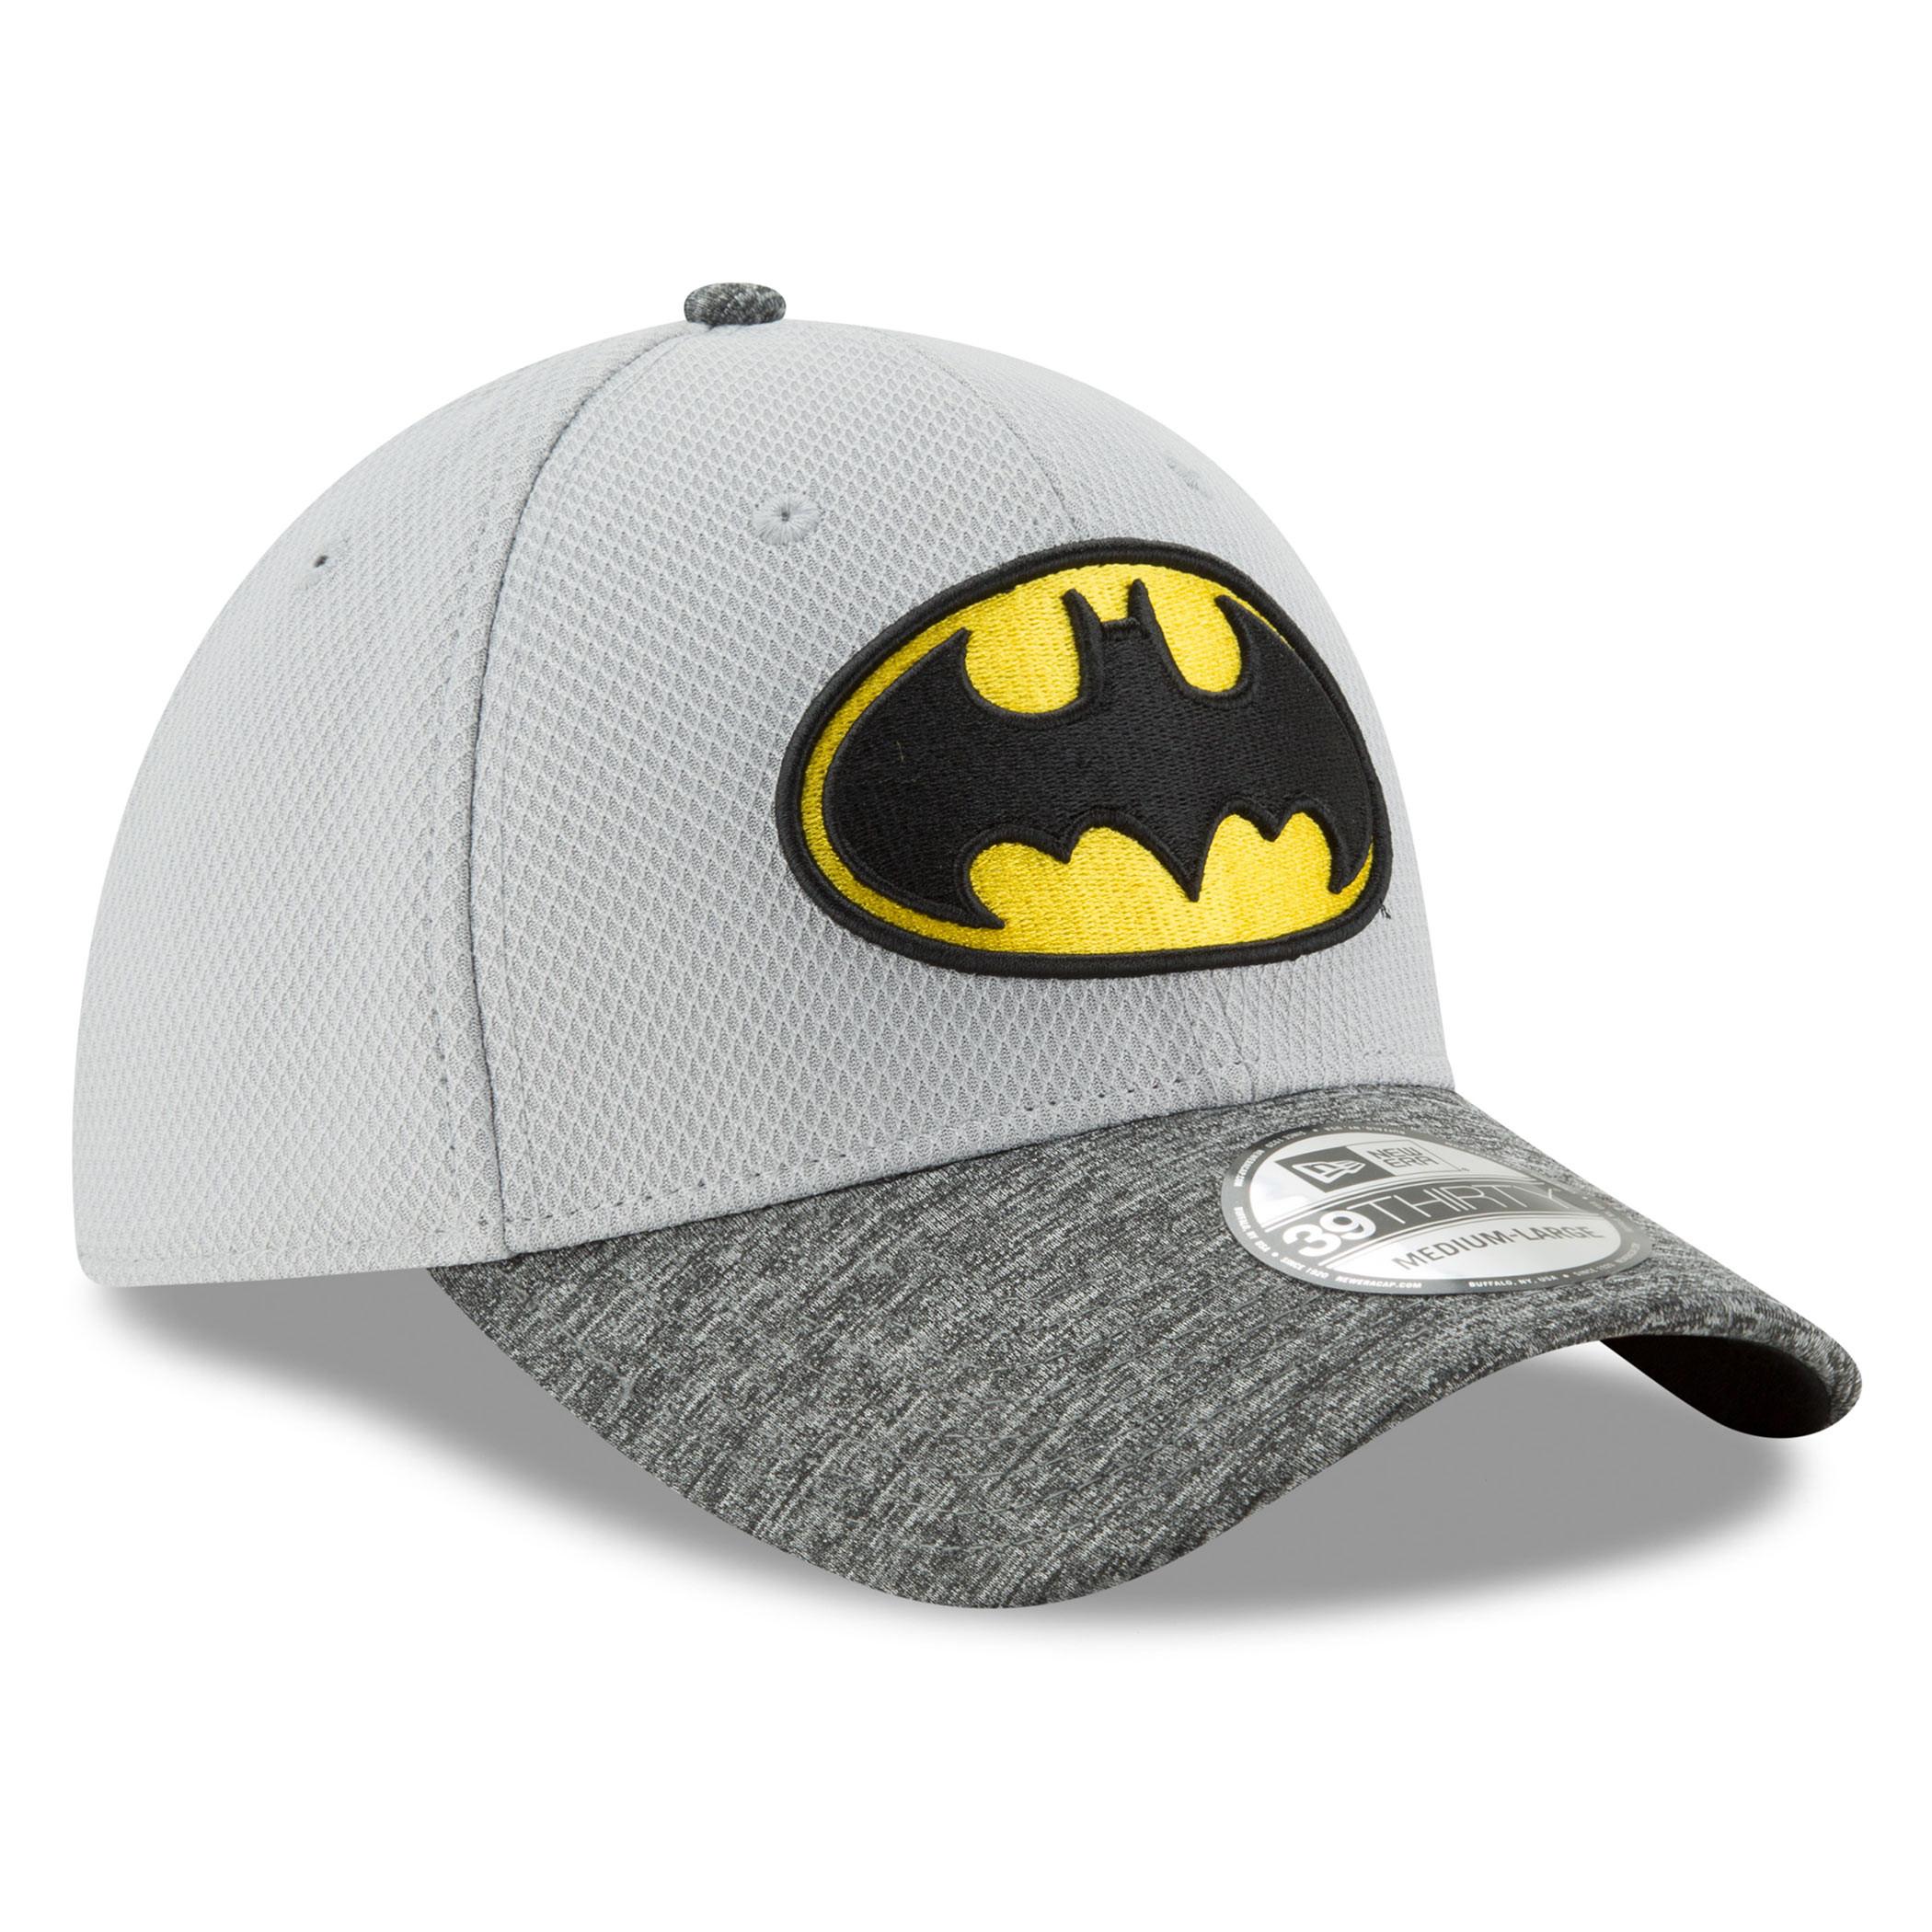 Batman Shaded Team Colors New Era 39Thirty Flex Fitted Hat